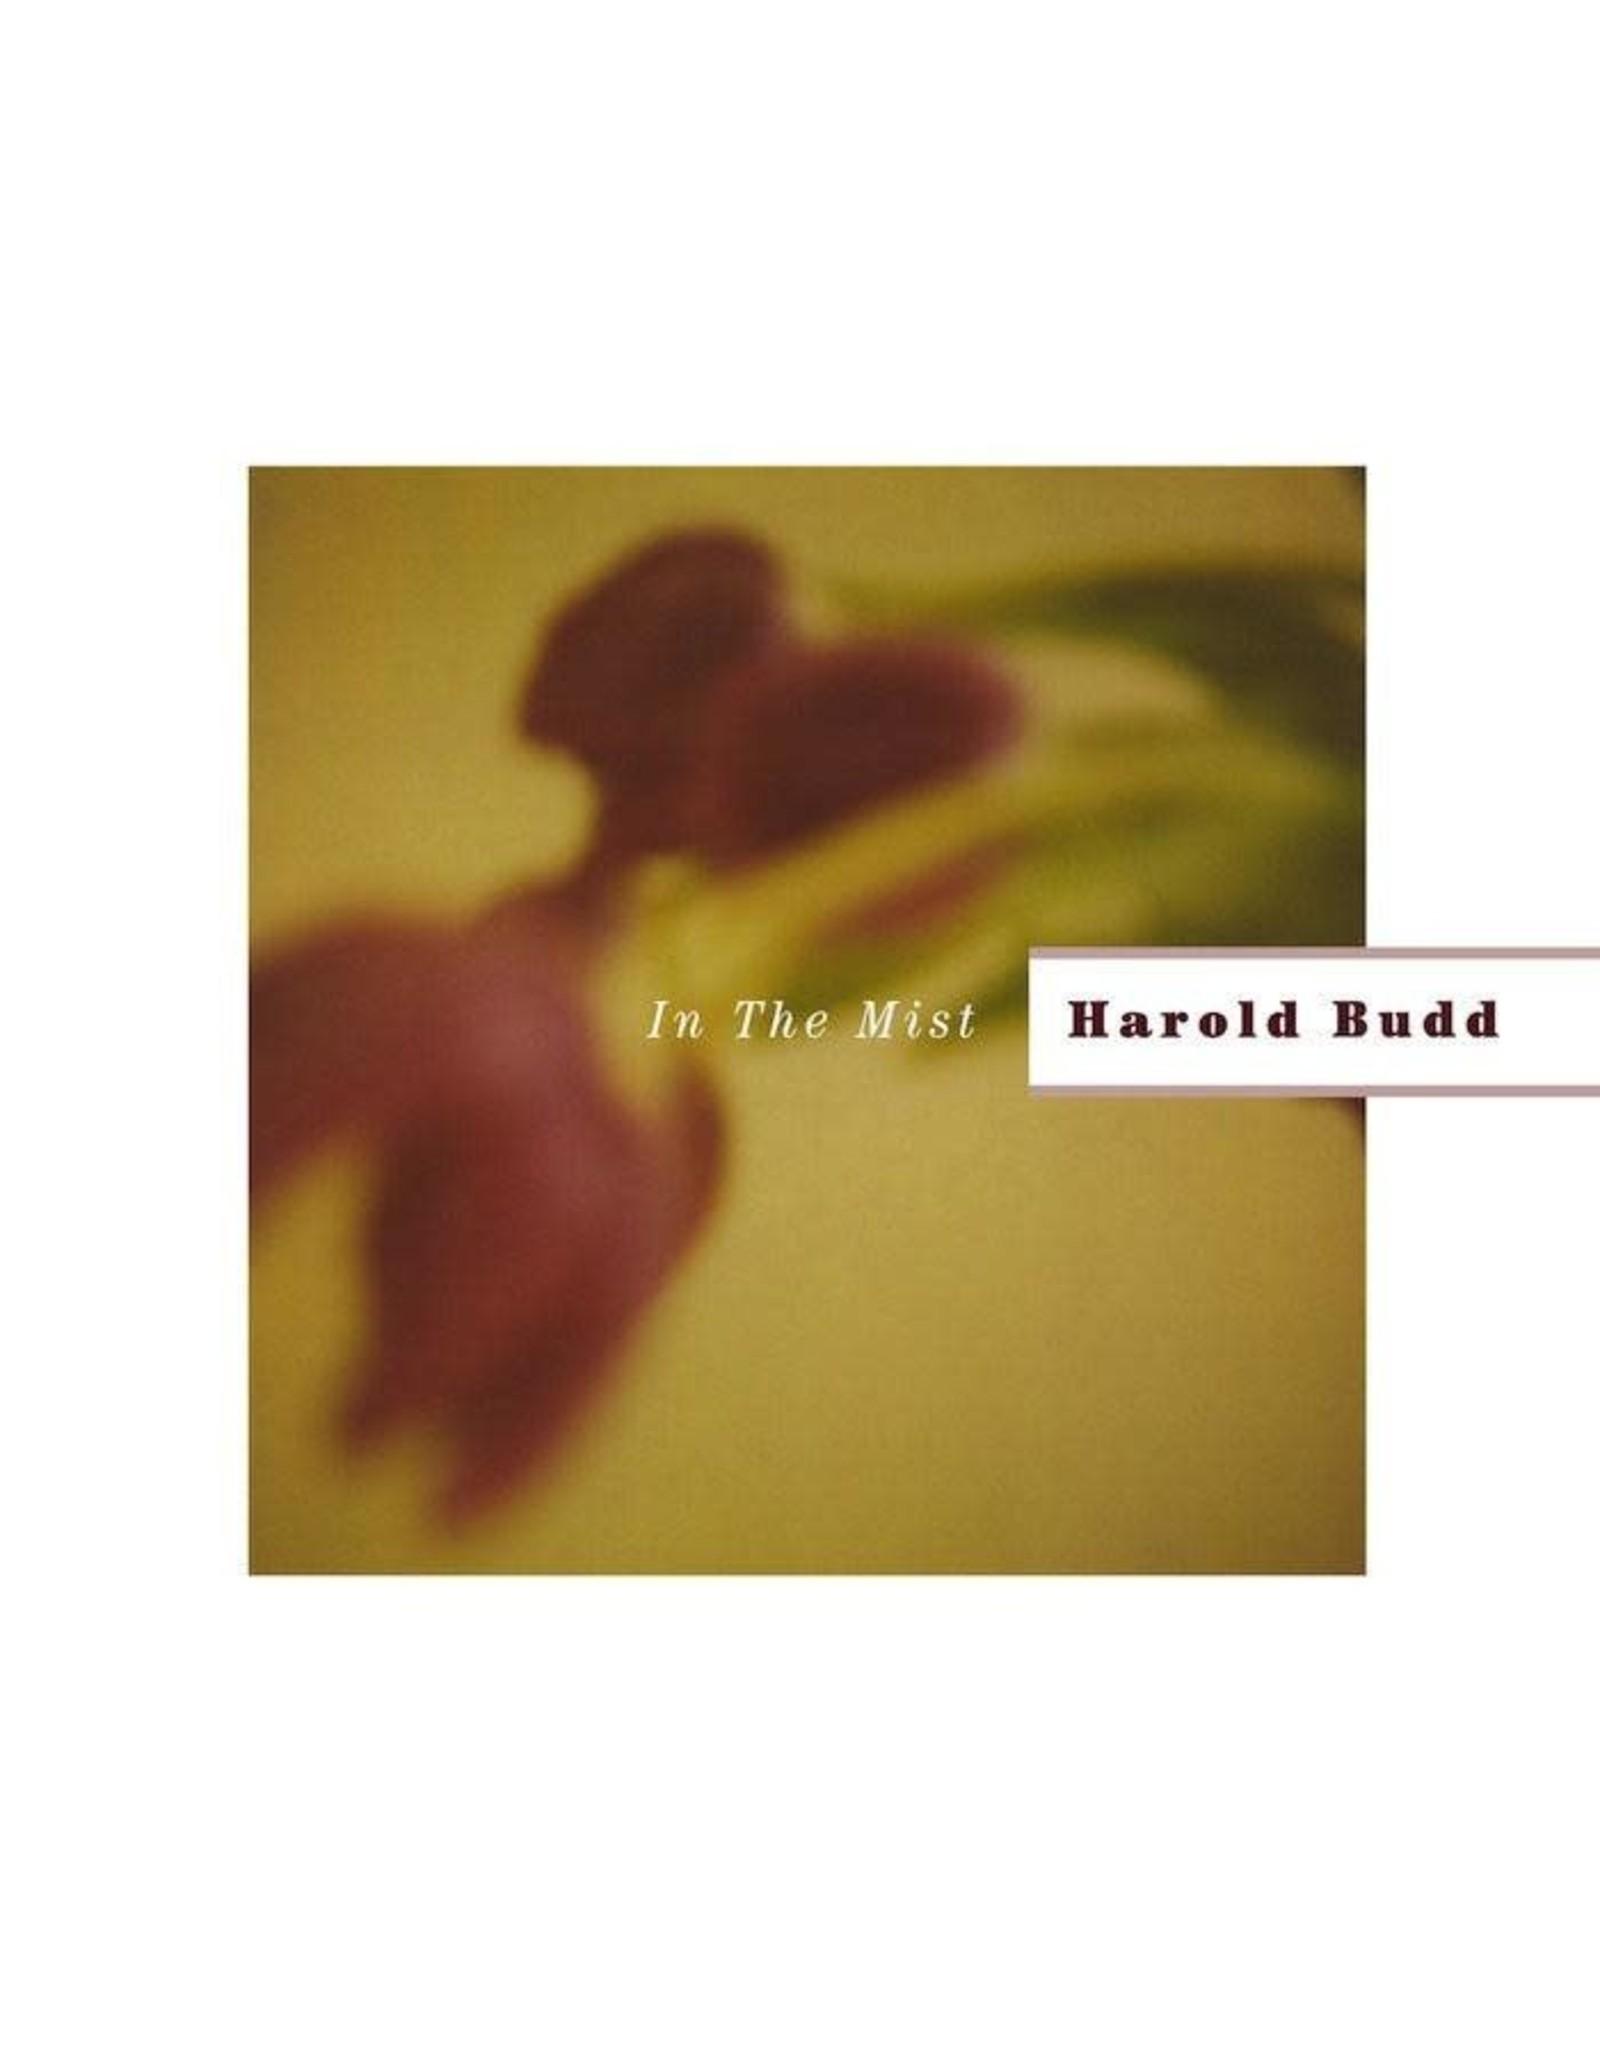 Darla Budd, Harold: In The Mist LP